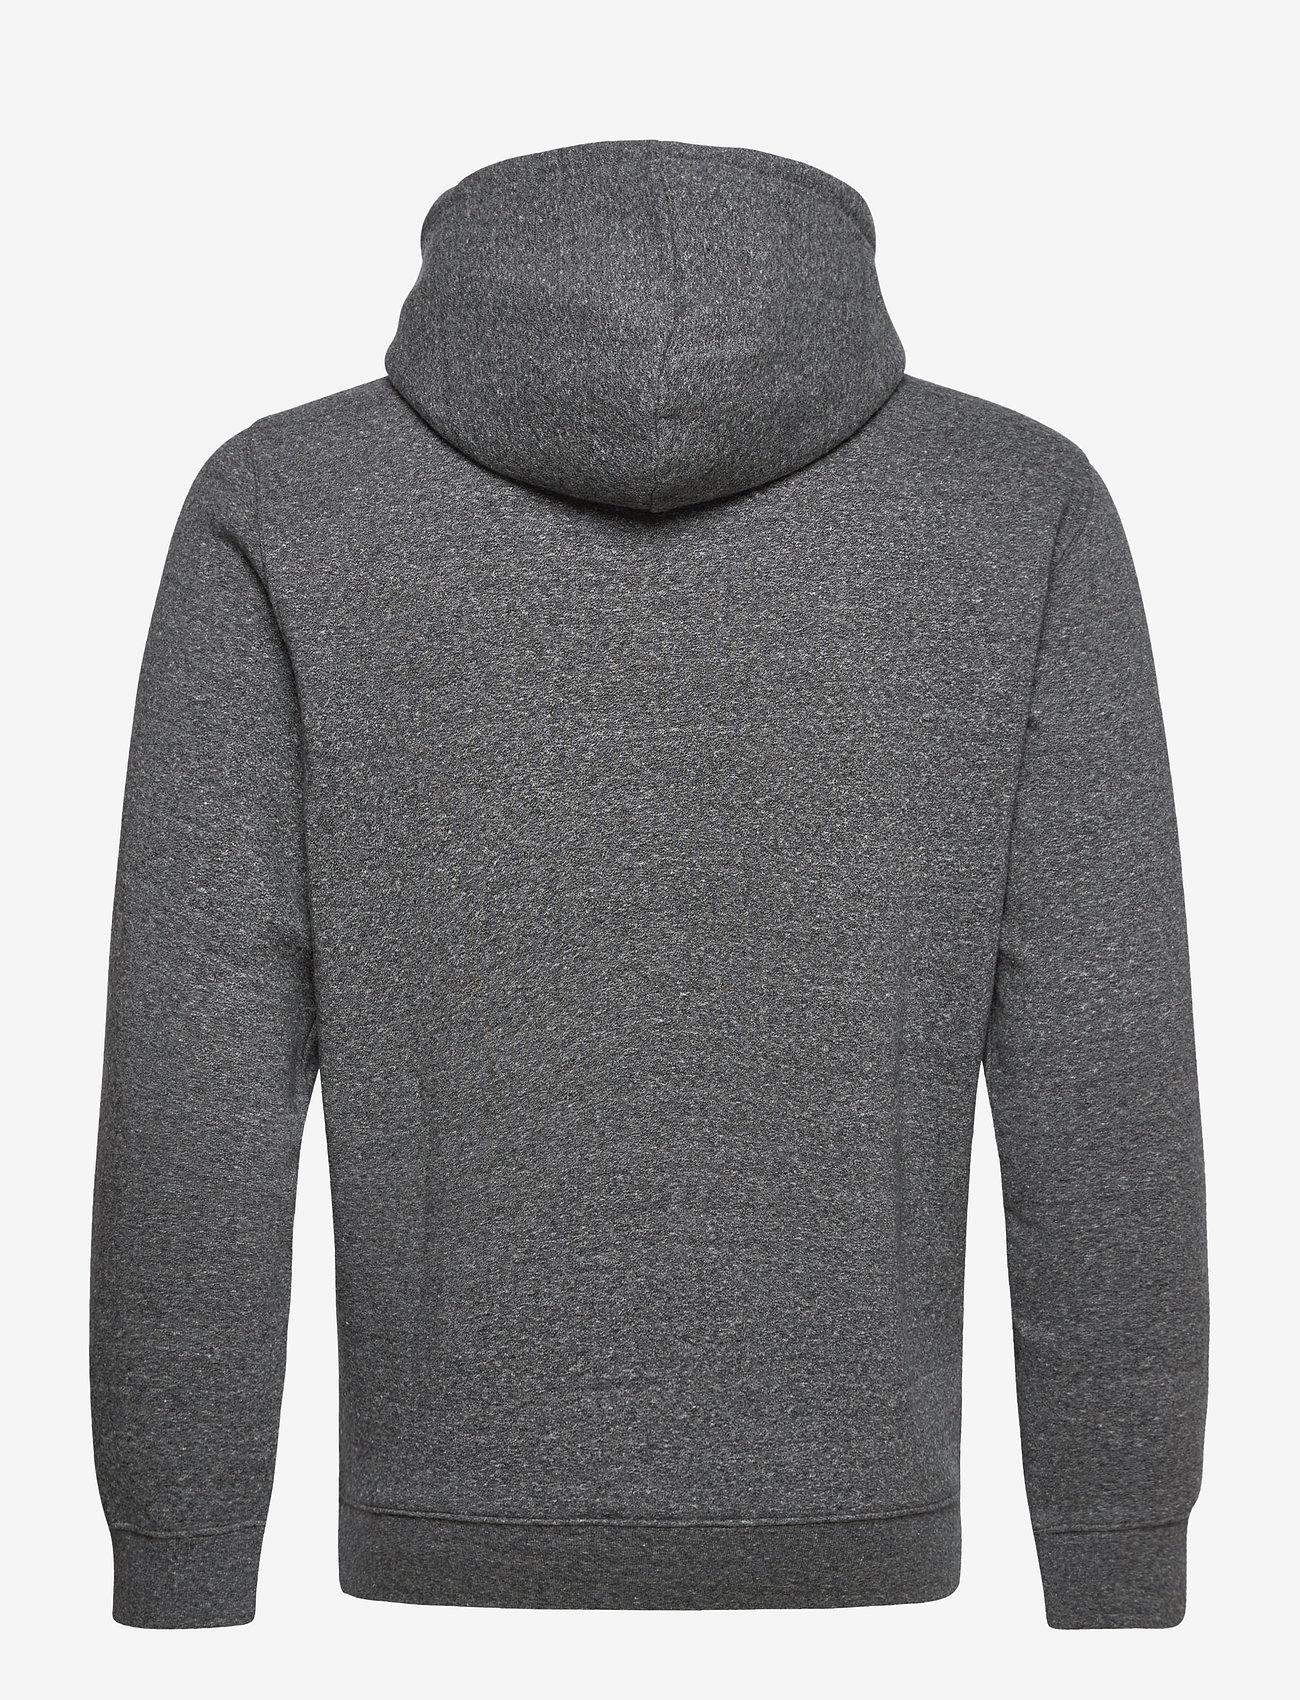 Champion Hooded Sweatshirt - Sweatshirts GRAY MELANGE DARK - Menn Klær